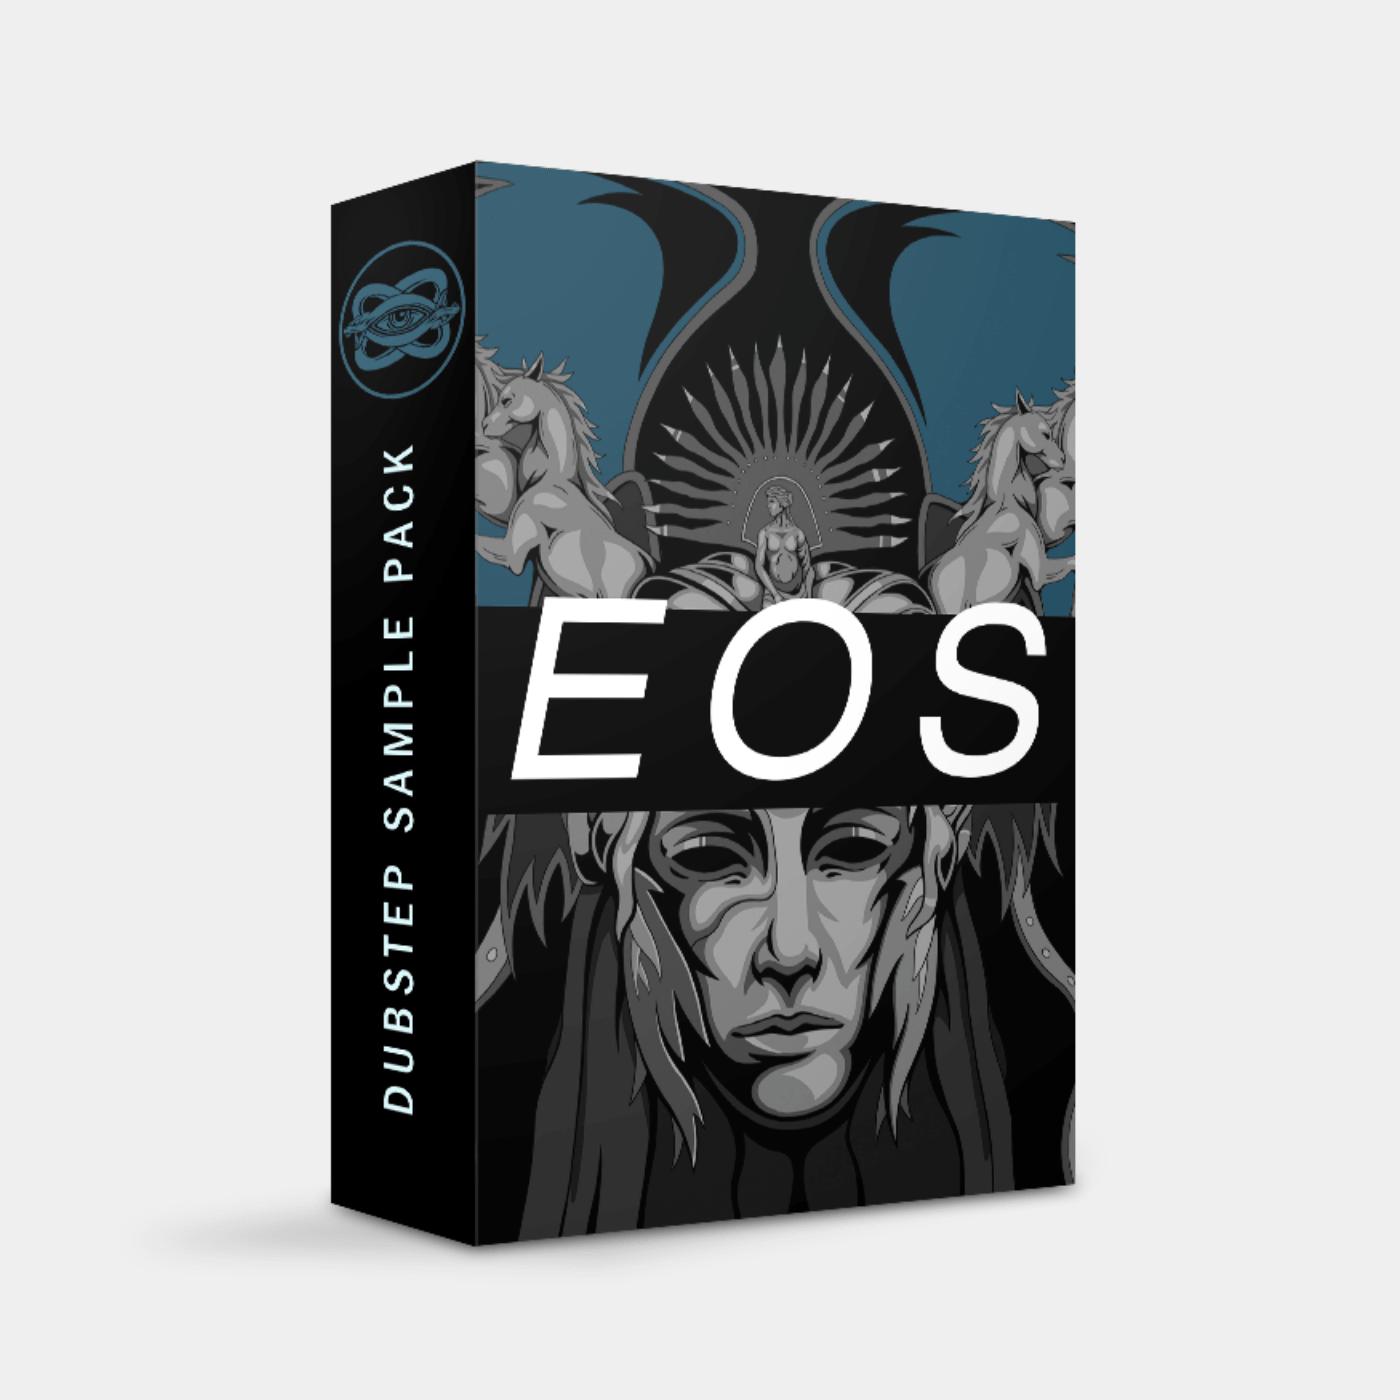 Eos Dubstep Sample Pack